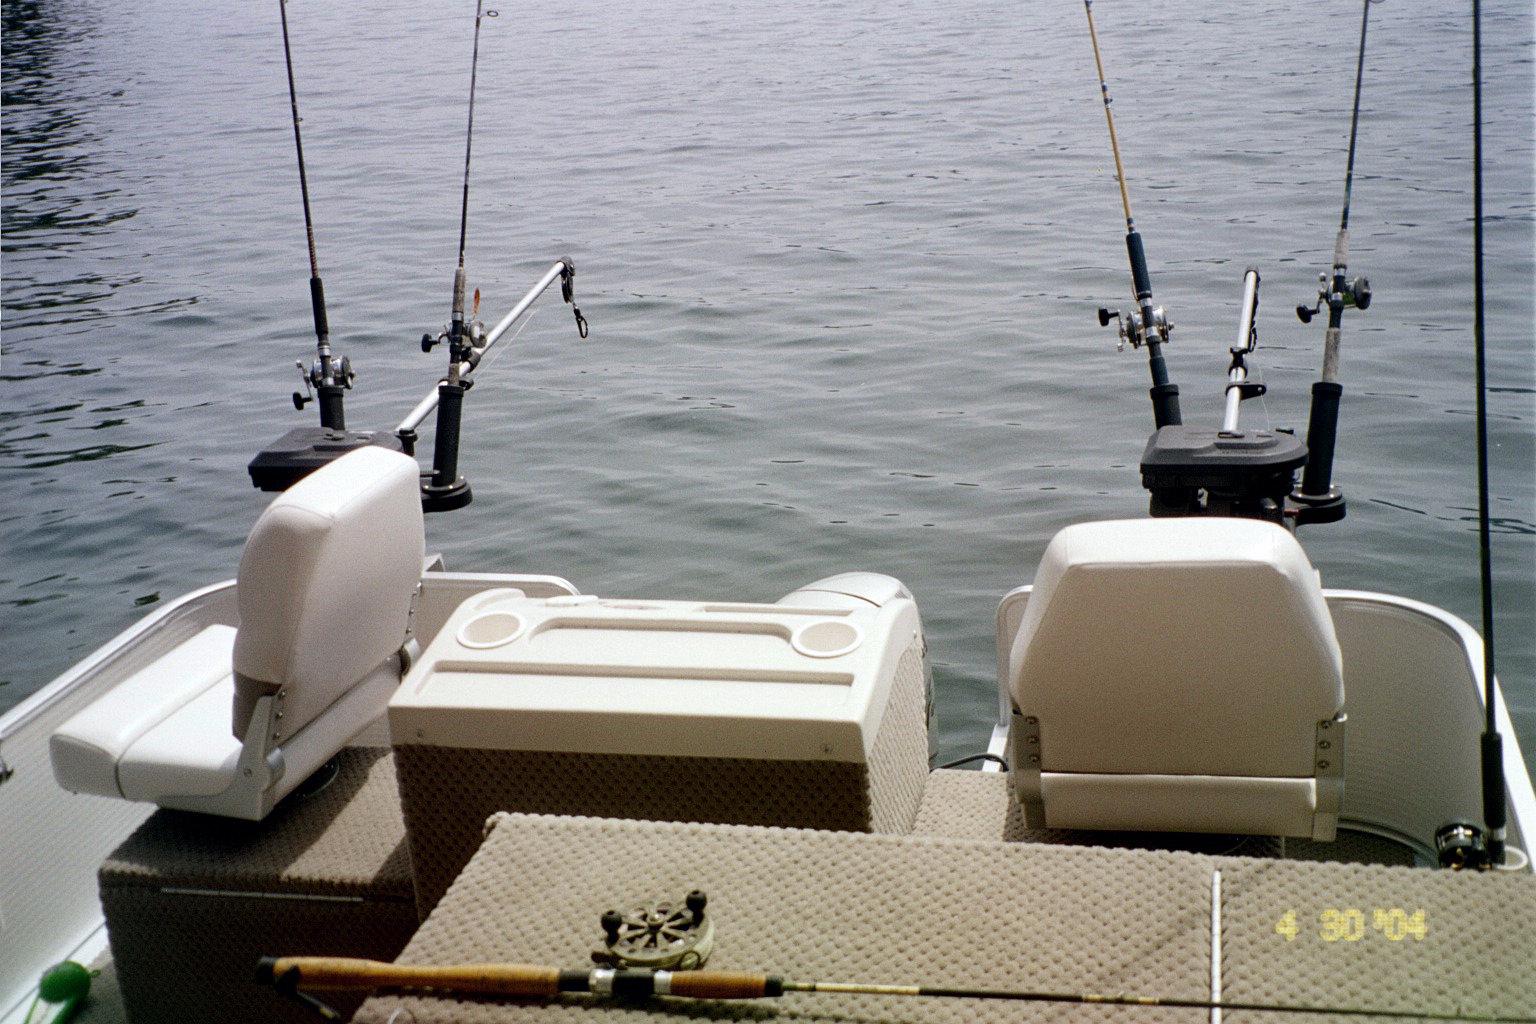 Custom fishing pontoon boats images for Boat fishing near me